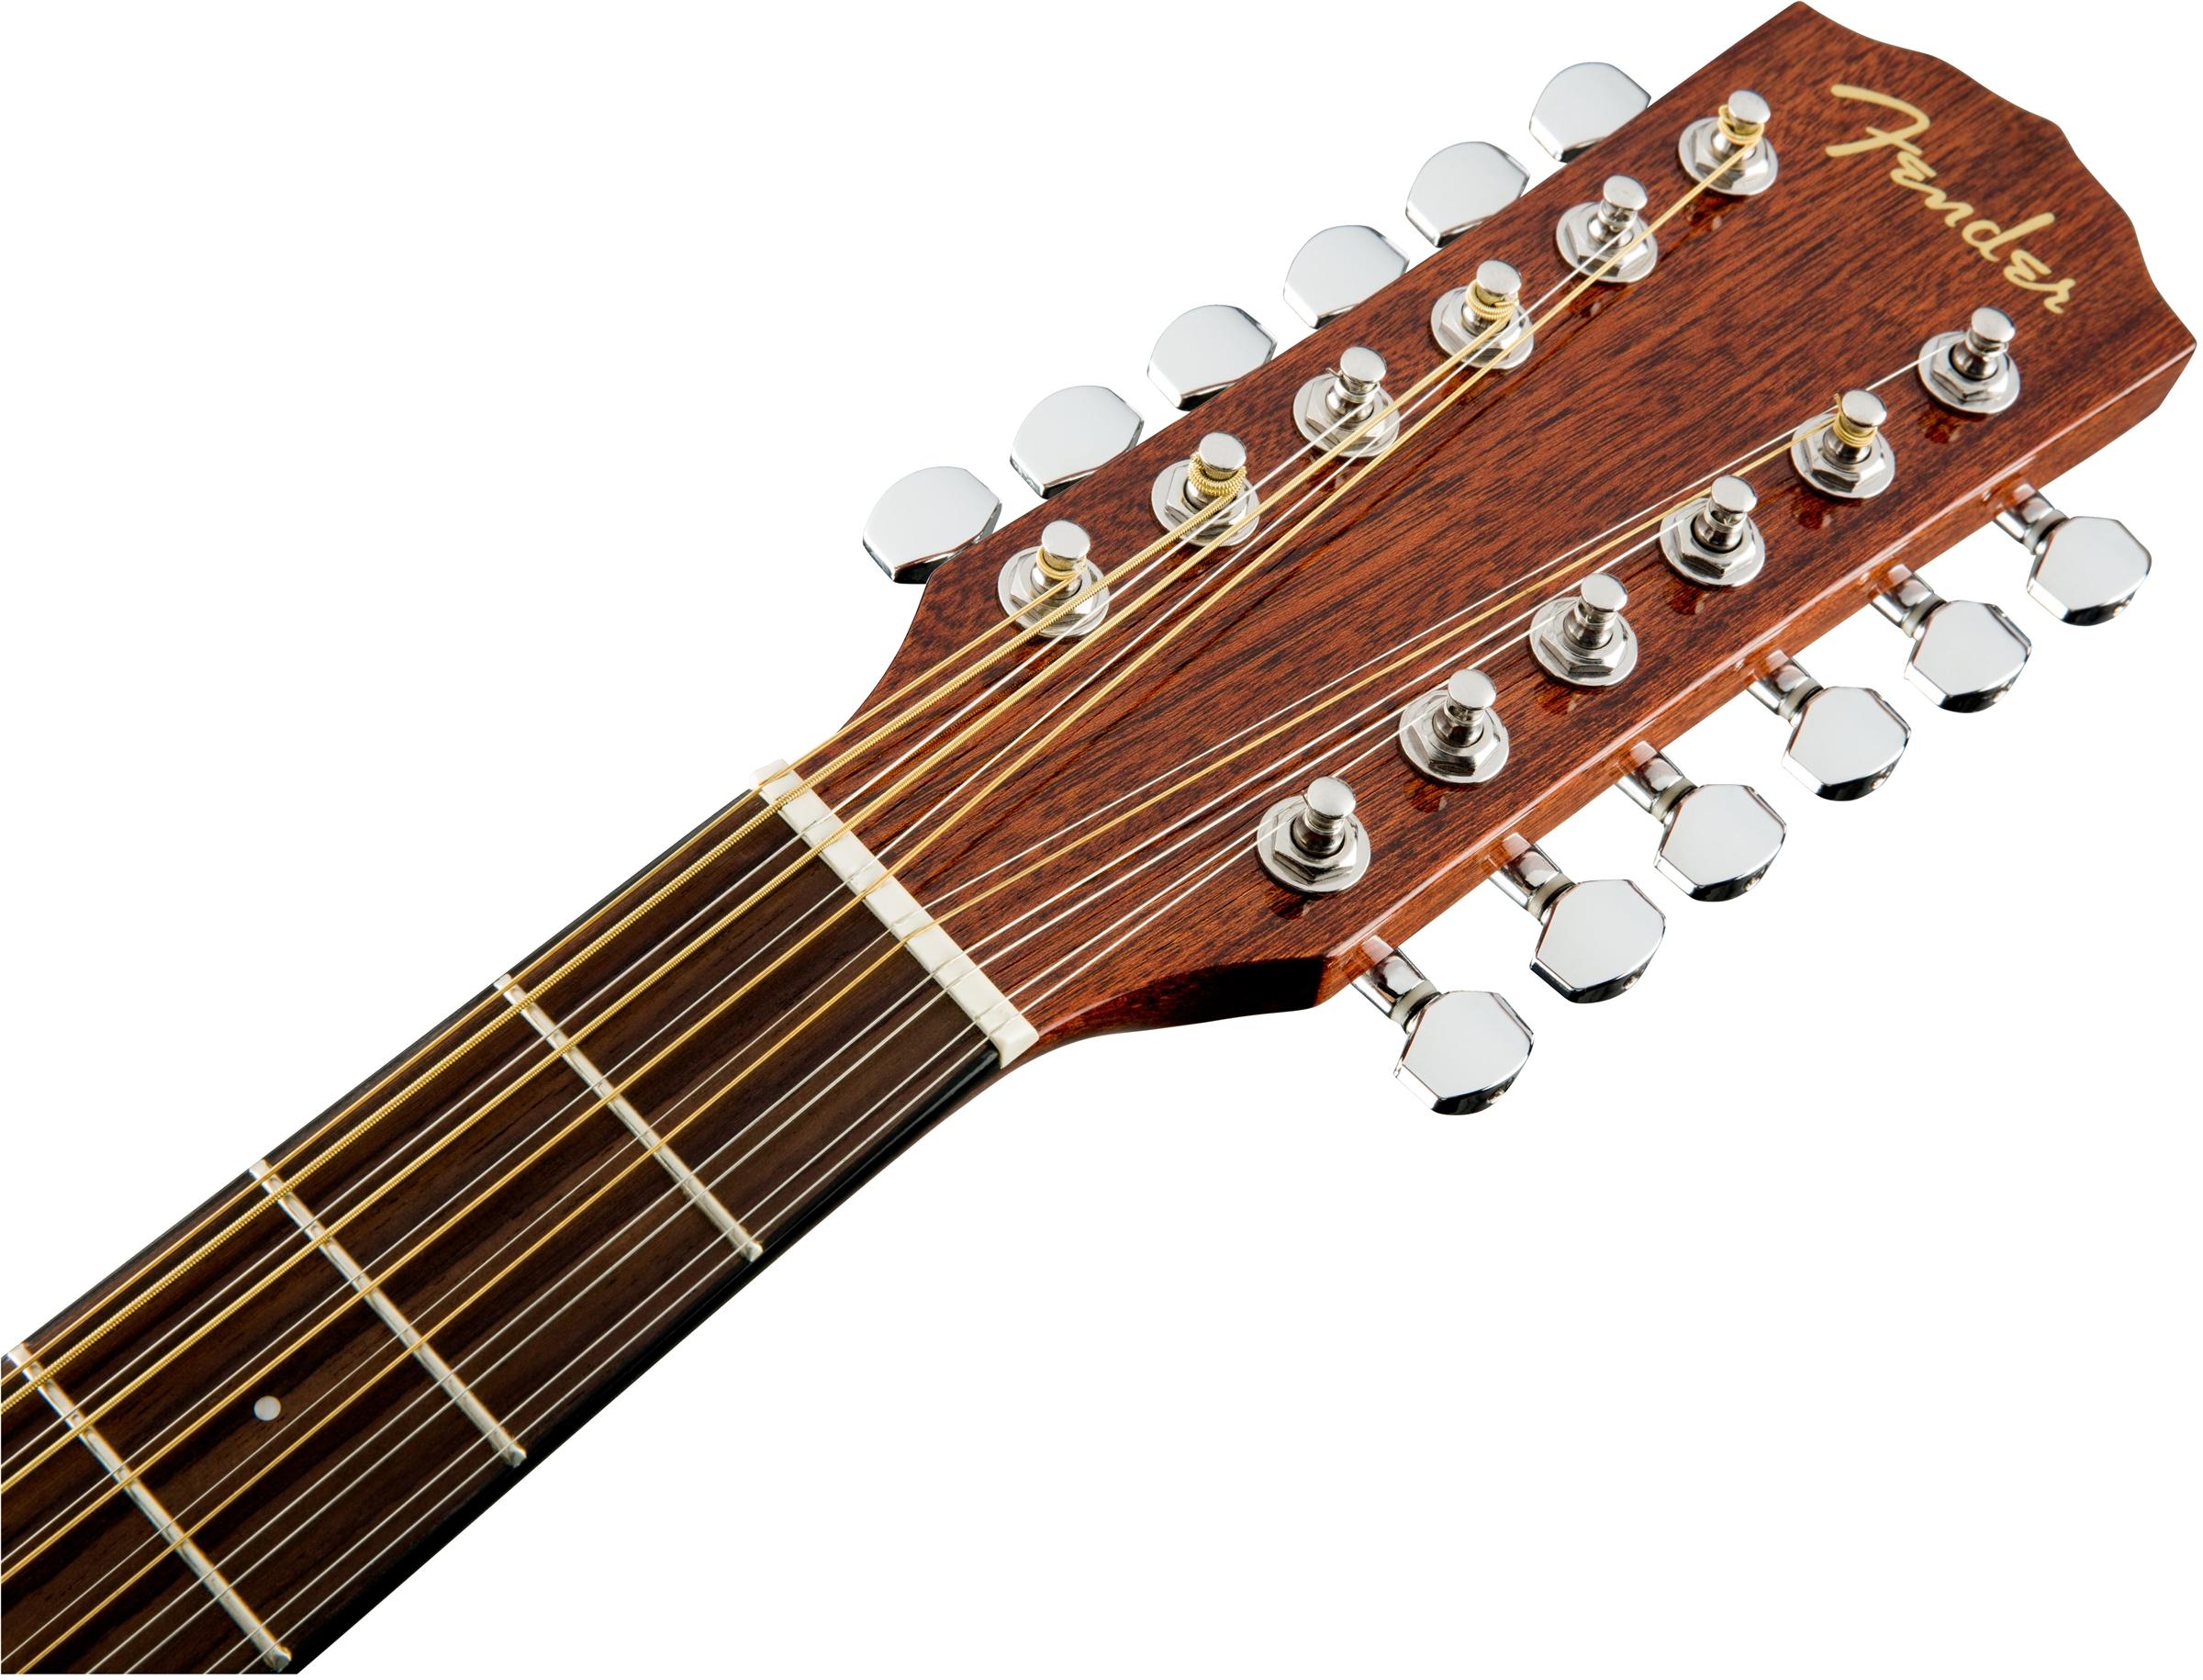 cd 60sce dreadnought 12 string acoustic guitars. Black Bedroom Furniture Sets. Home Design Ideas